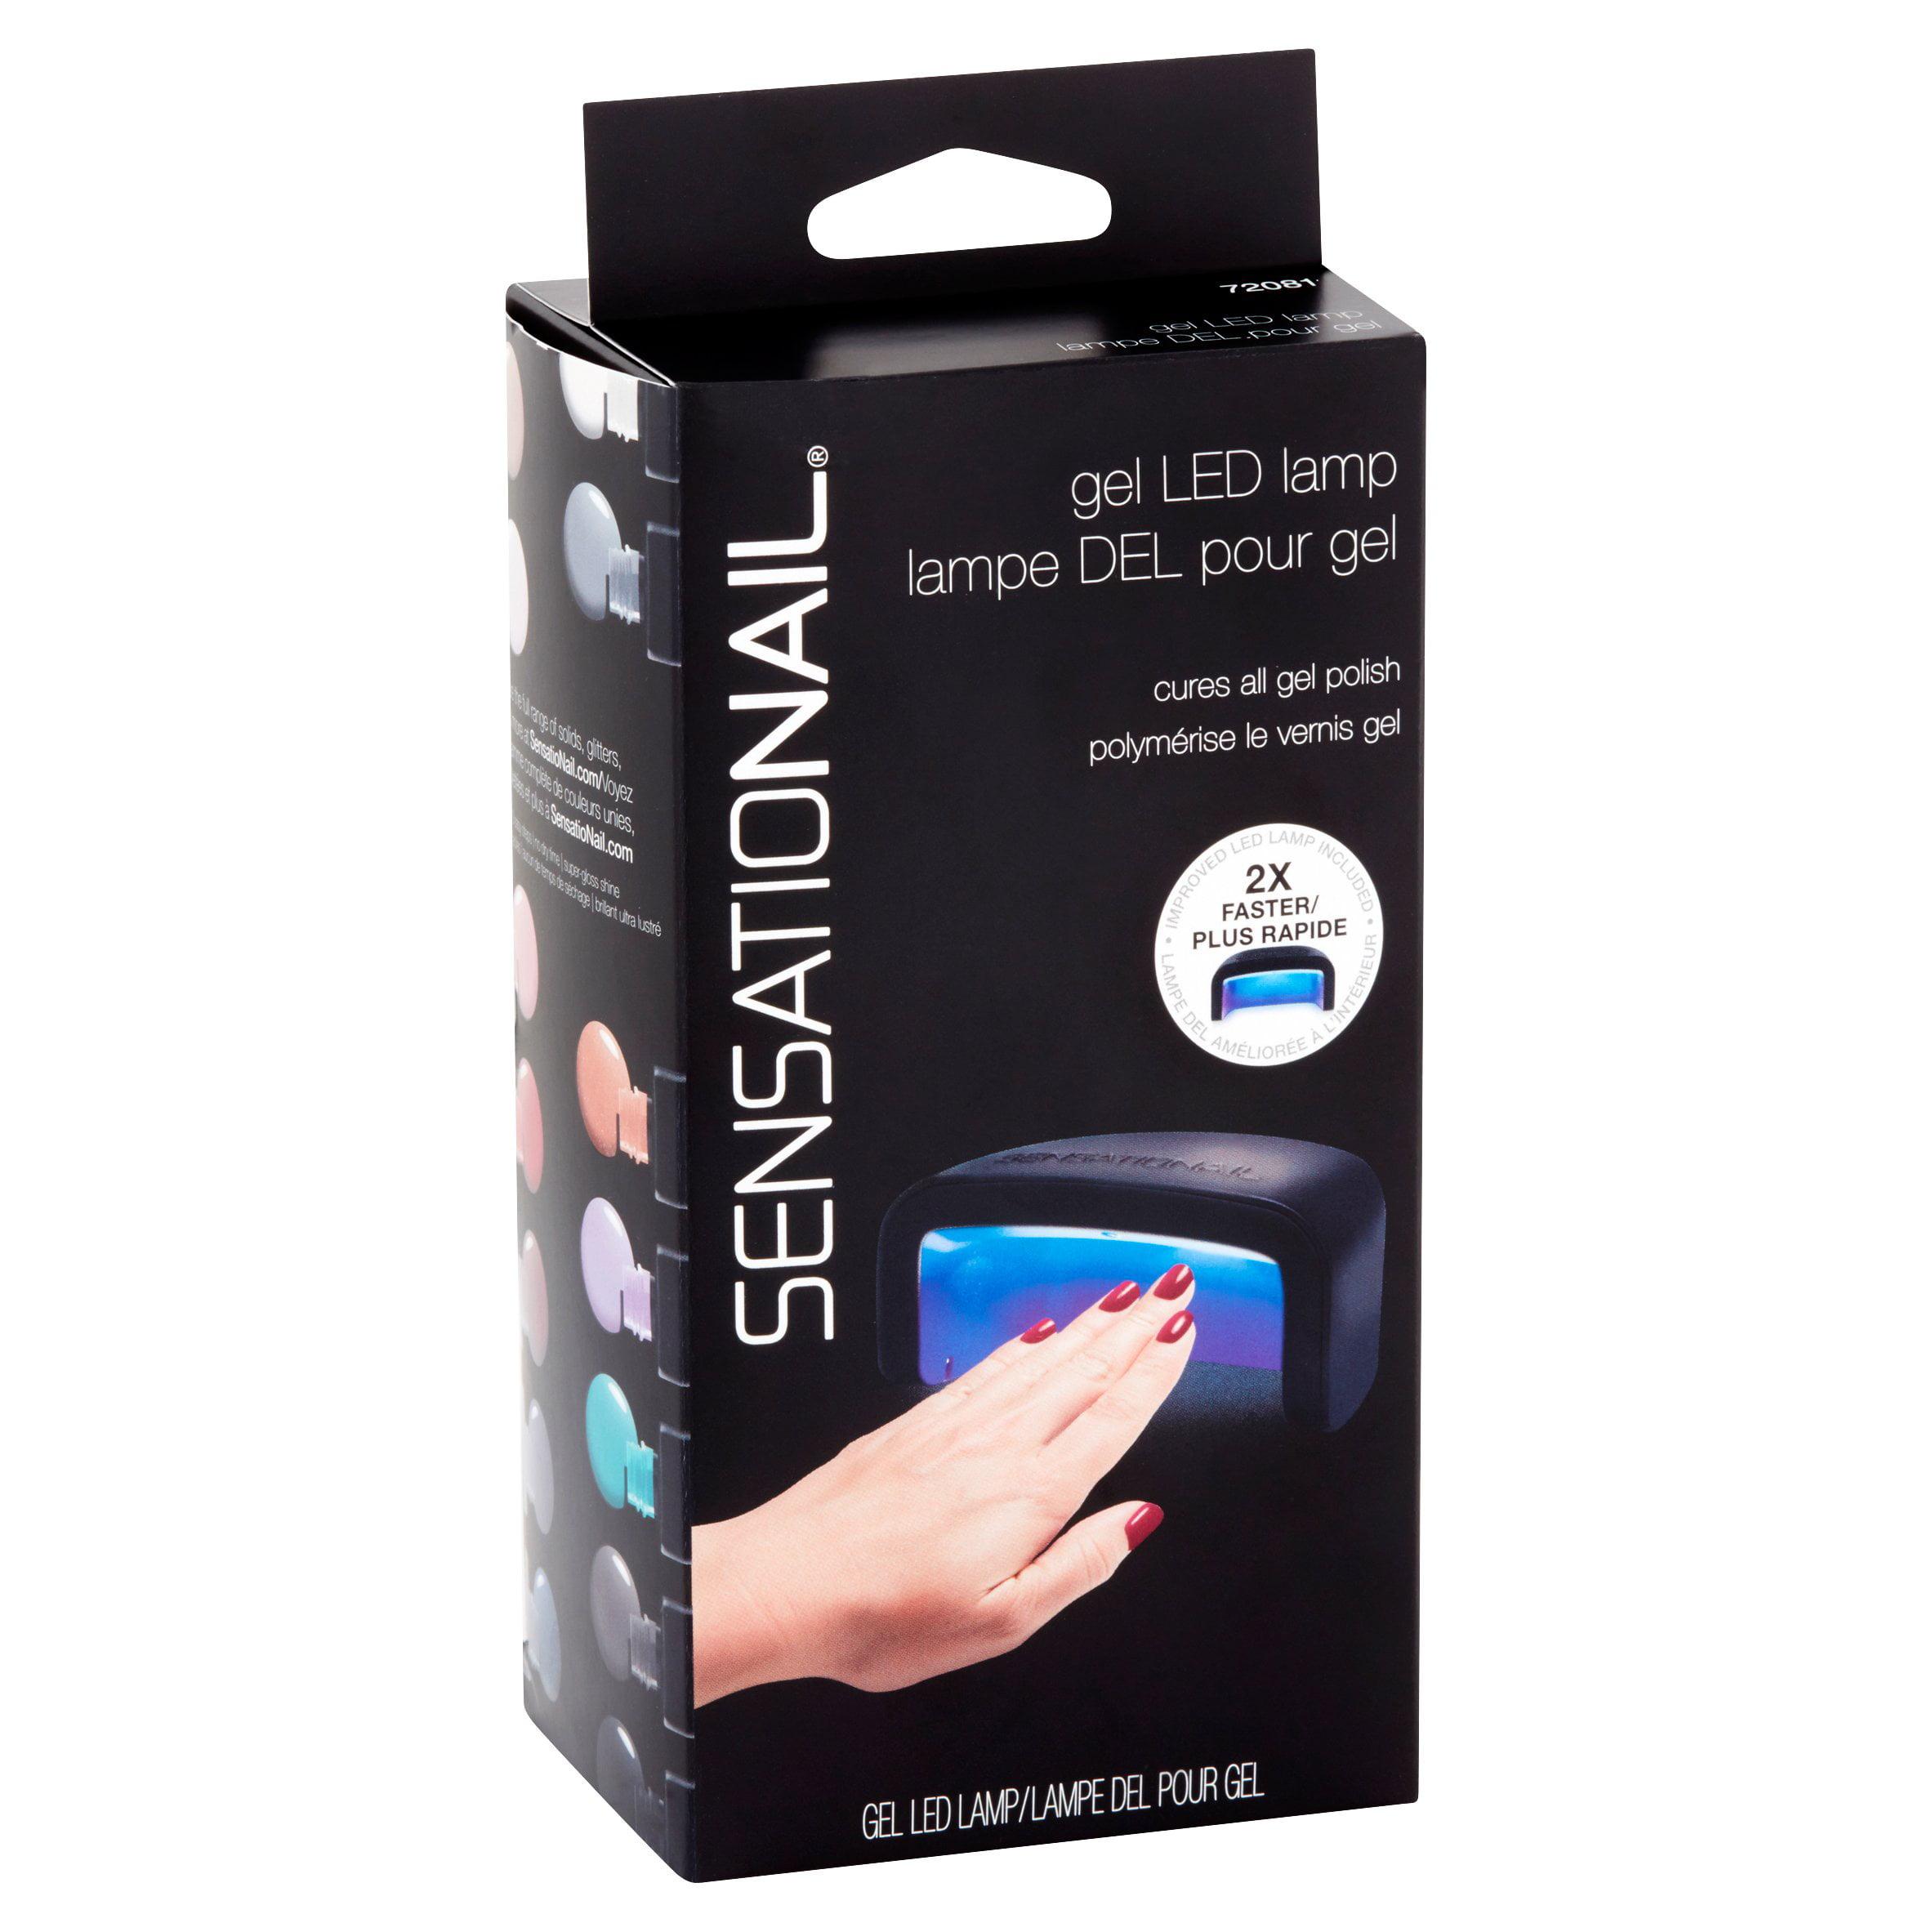 SensatioNail Pro 3060 LED Lamp Gel Polish Dryer - Walmart.com